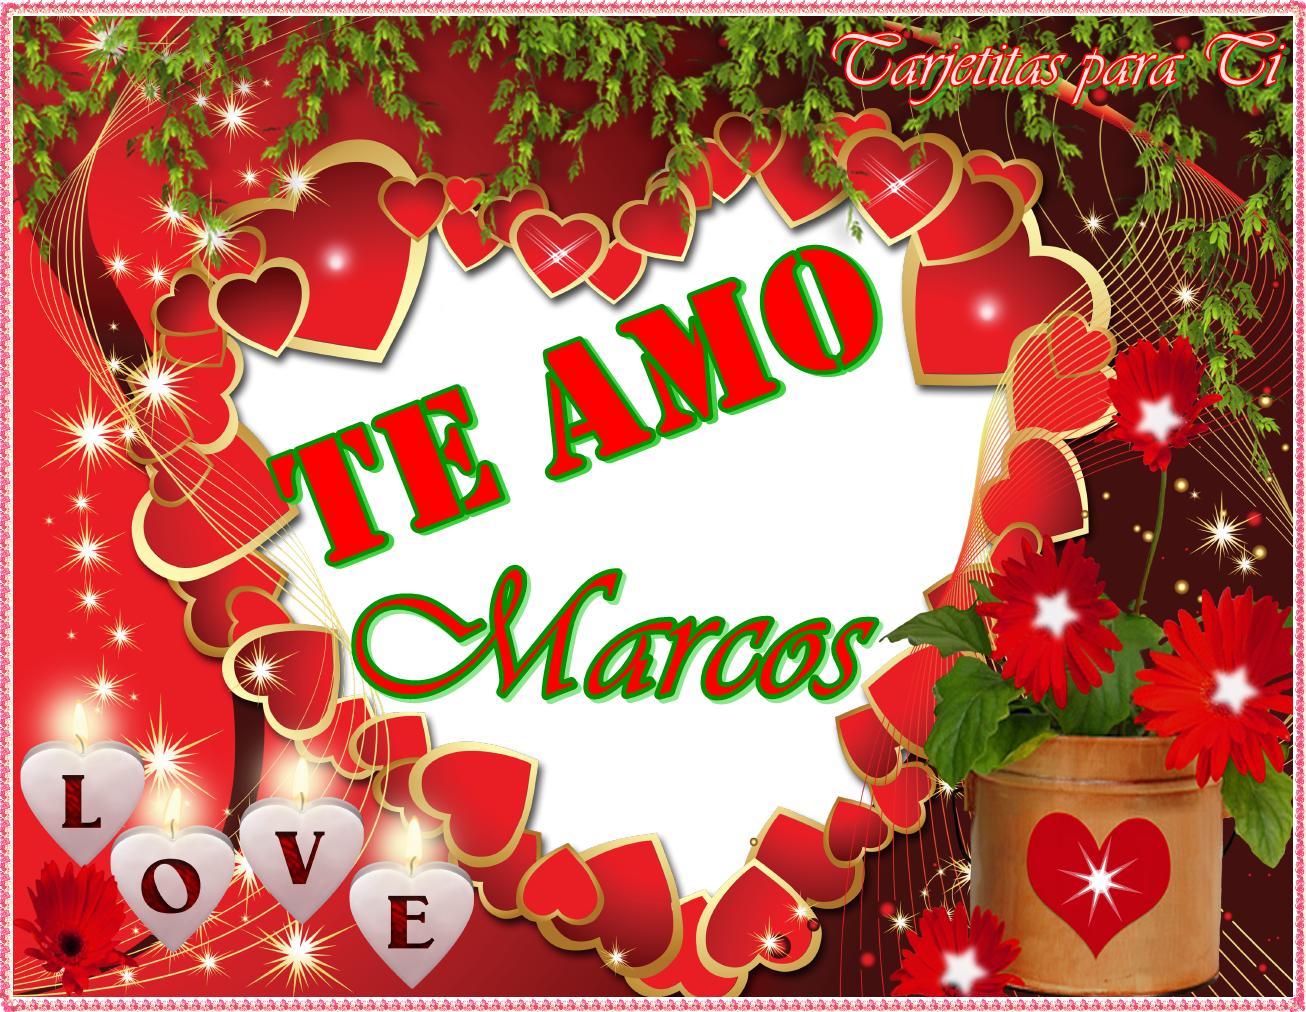 best Ver Imagenes Que Digan Marcos Te Amo image collection